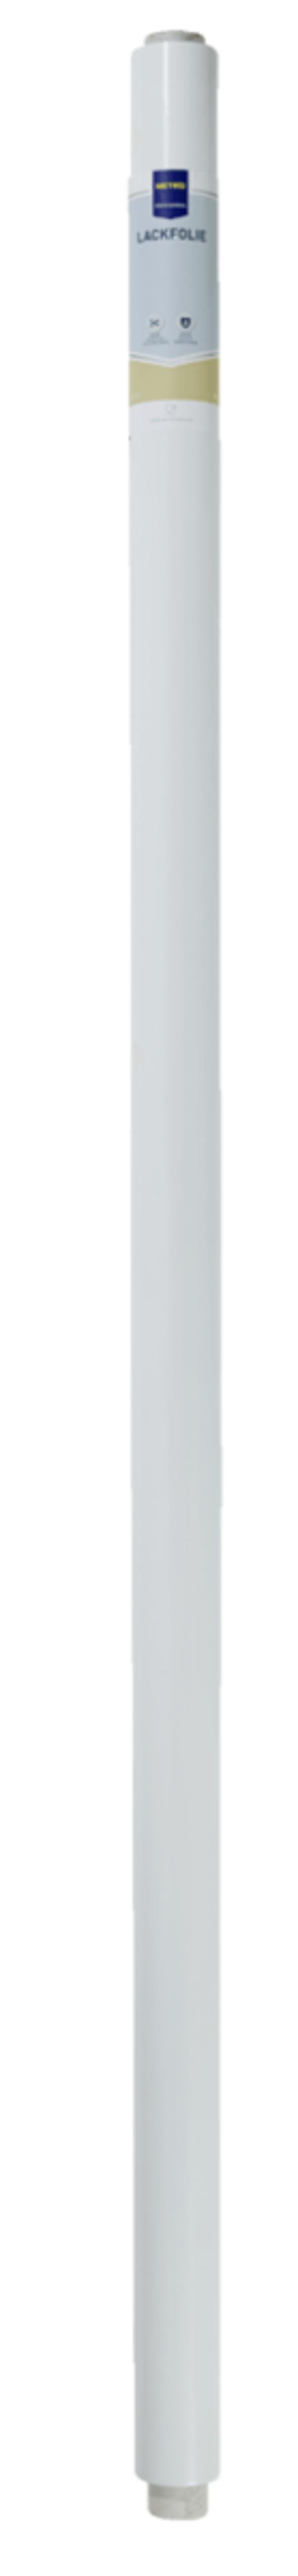 METRO Professional Lackfolie Uni Weiß